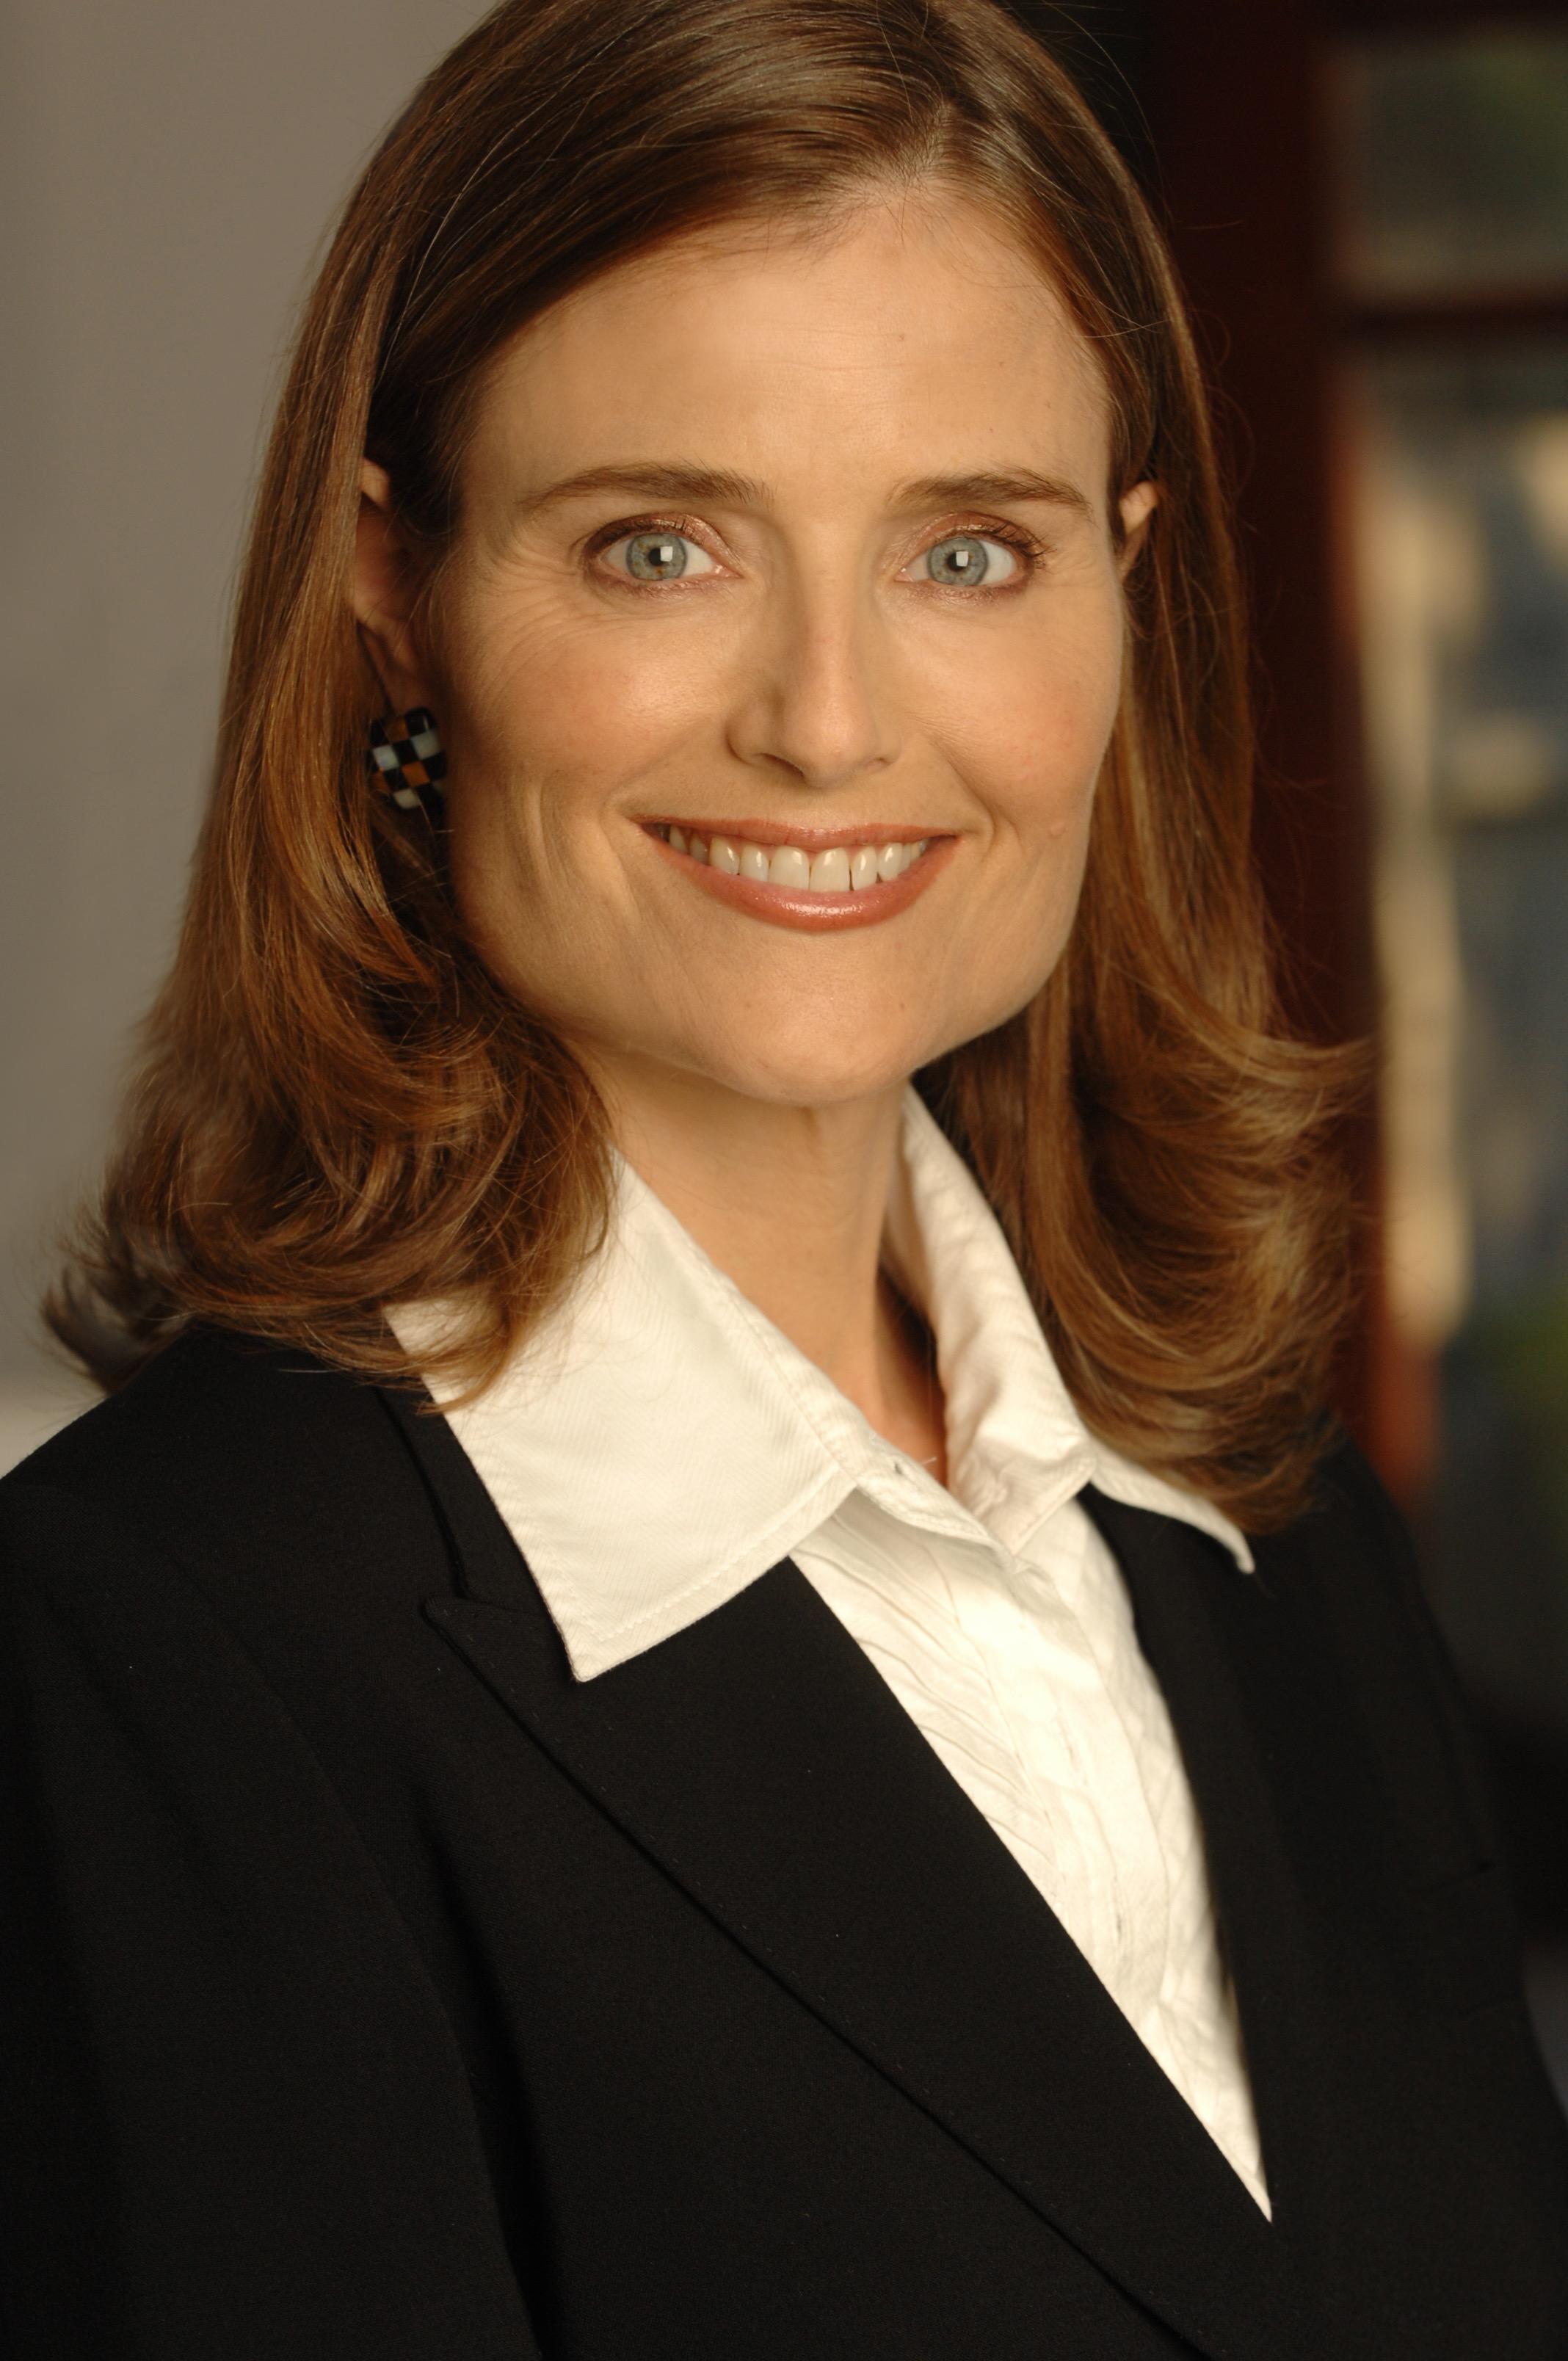 Elizabeth Karr